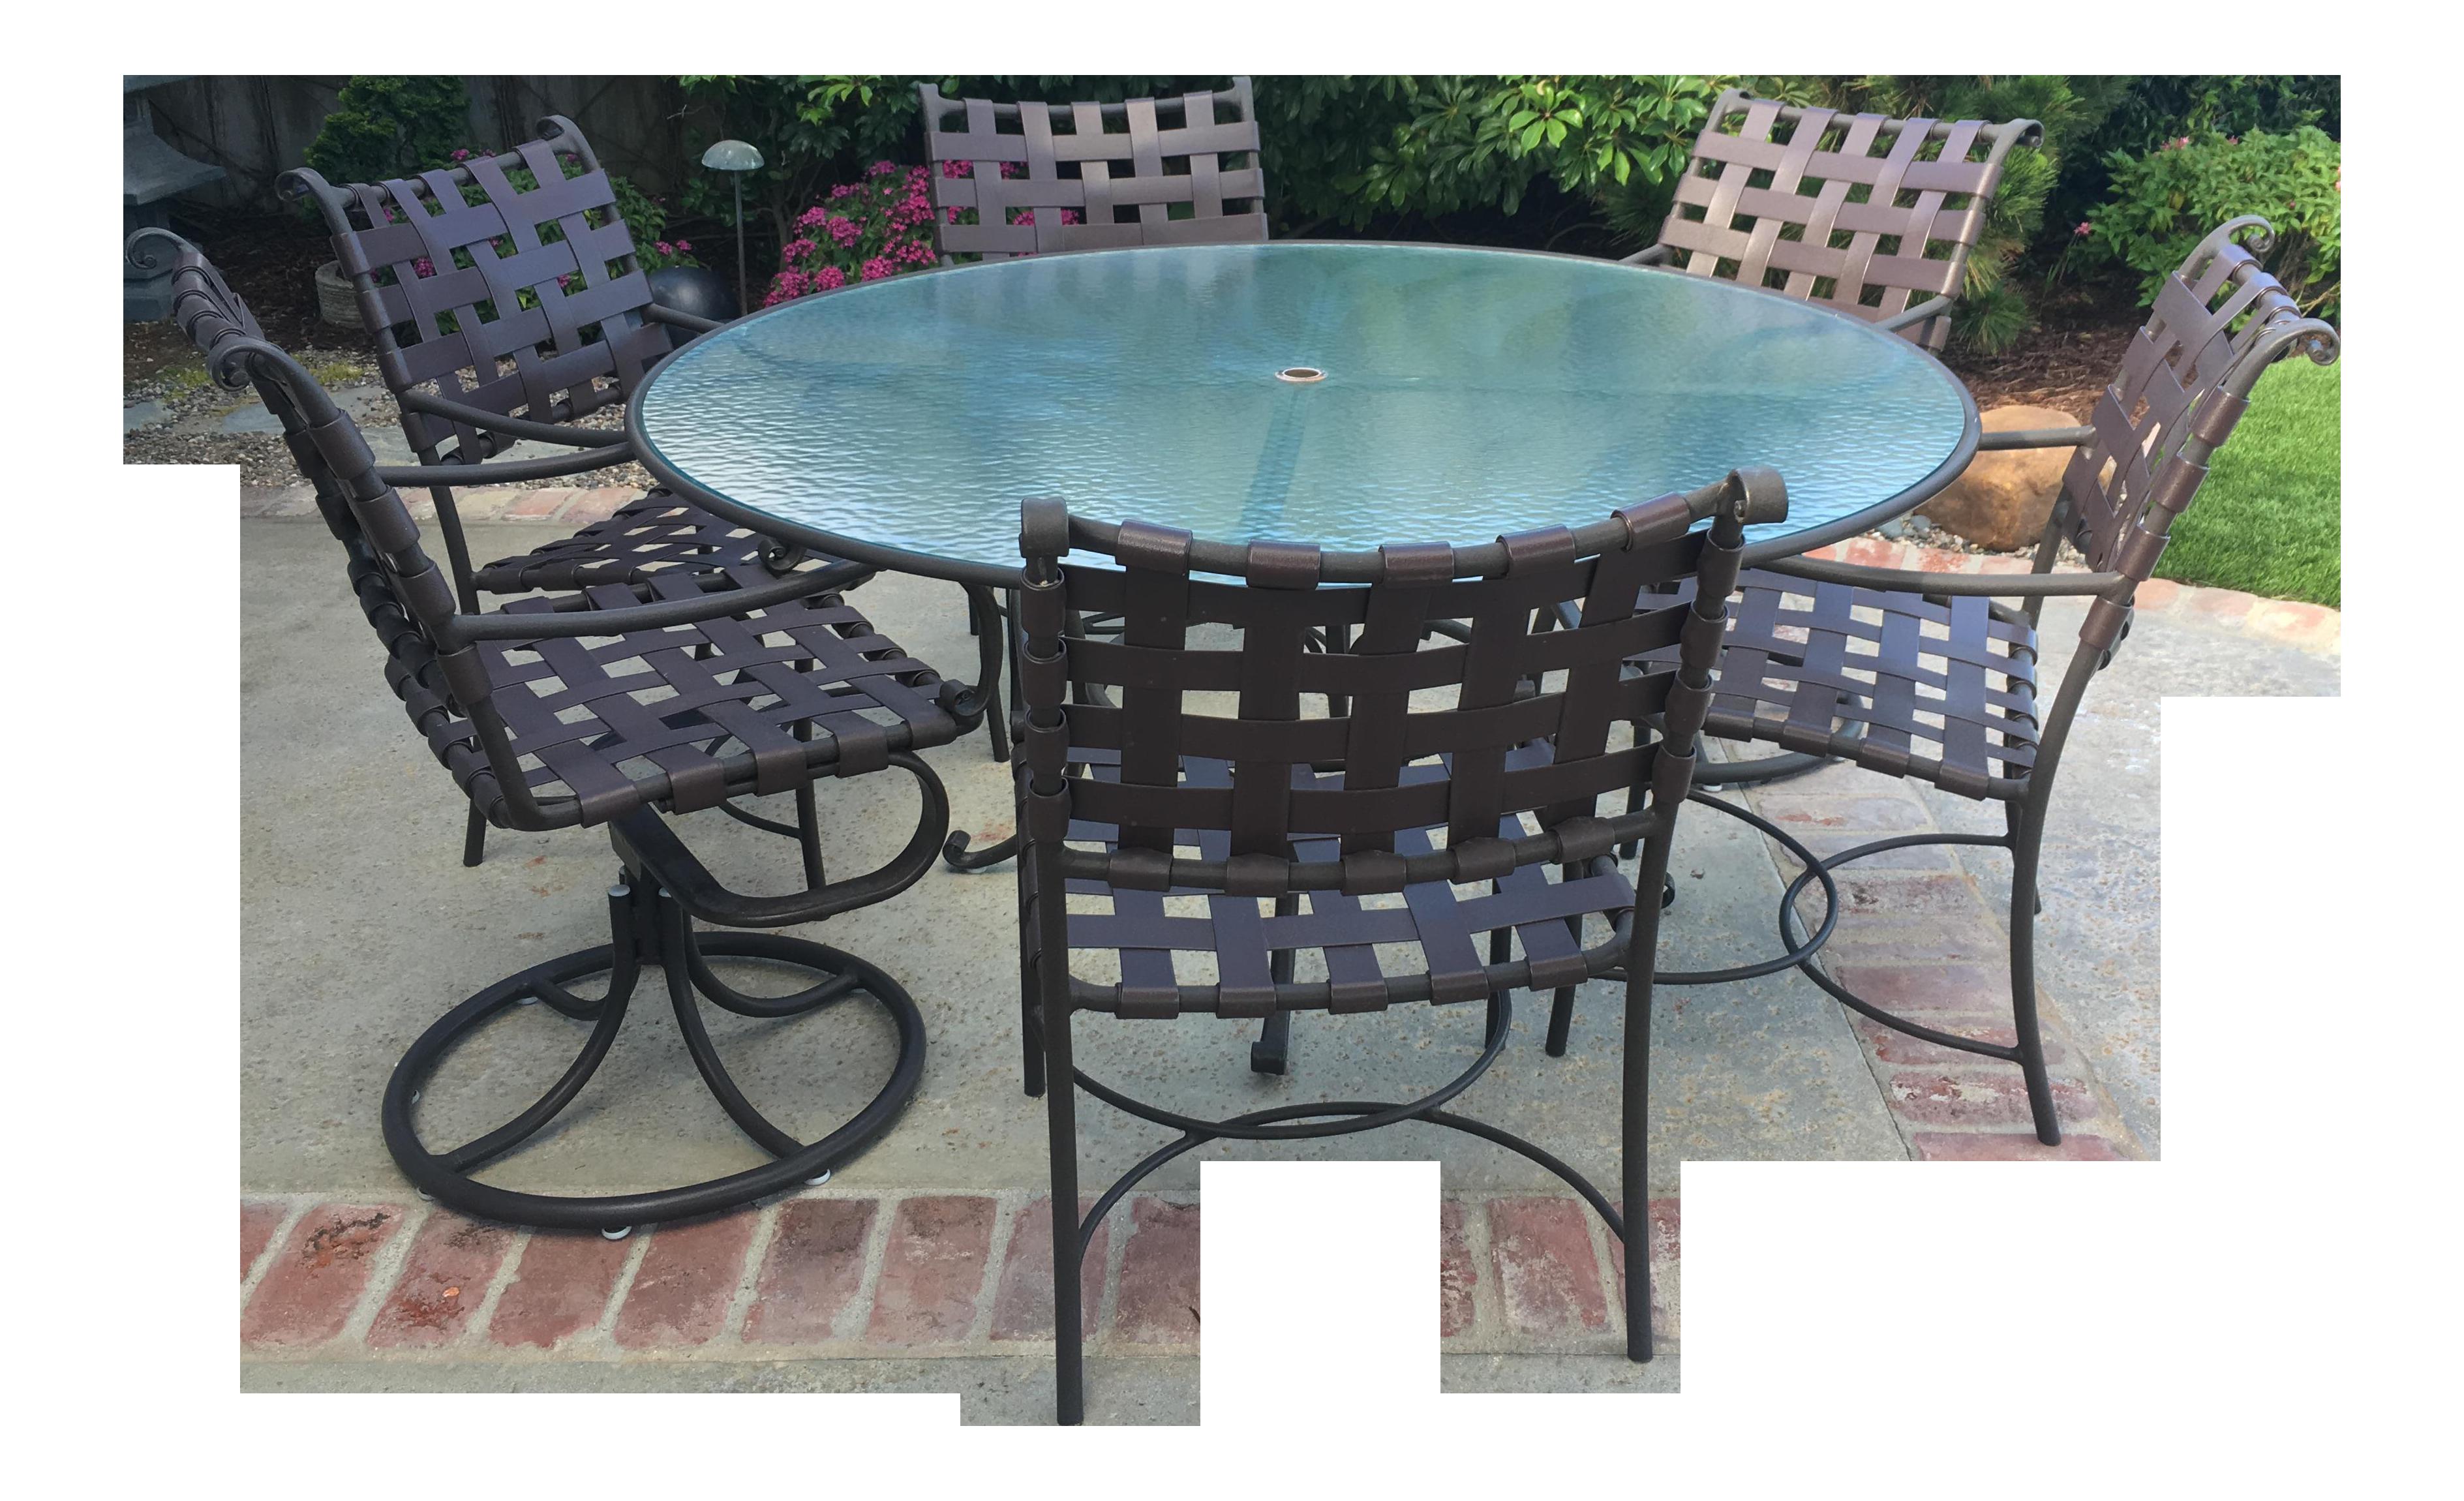 Brown Jordan Roma Collection Dining Table u0026 Six Chairs- Set of 7  sc 1 st  Chairish & Brown Jordan Roma Collection Dining Table u0026 Six Chairs- Set of 7 ...